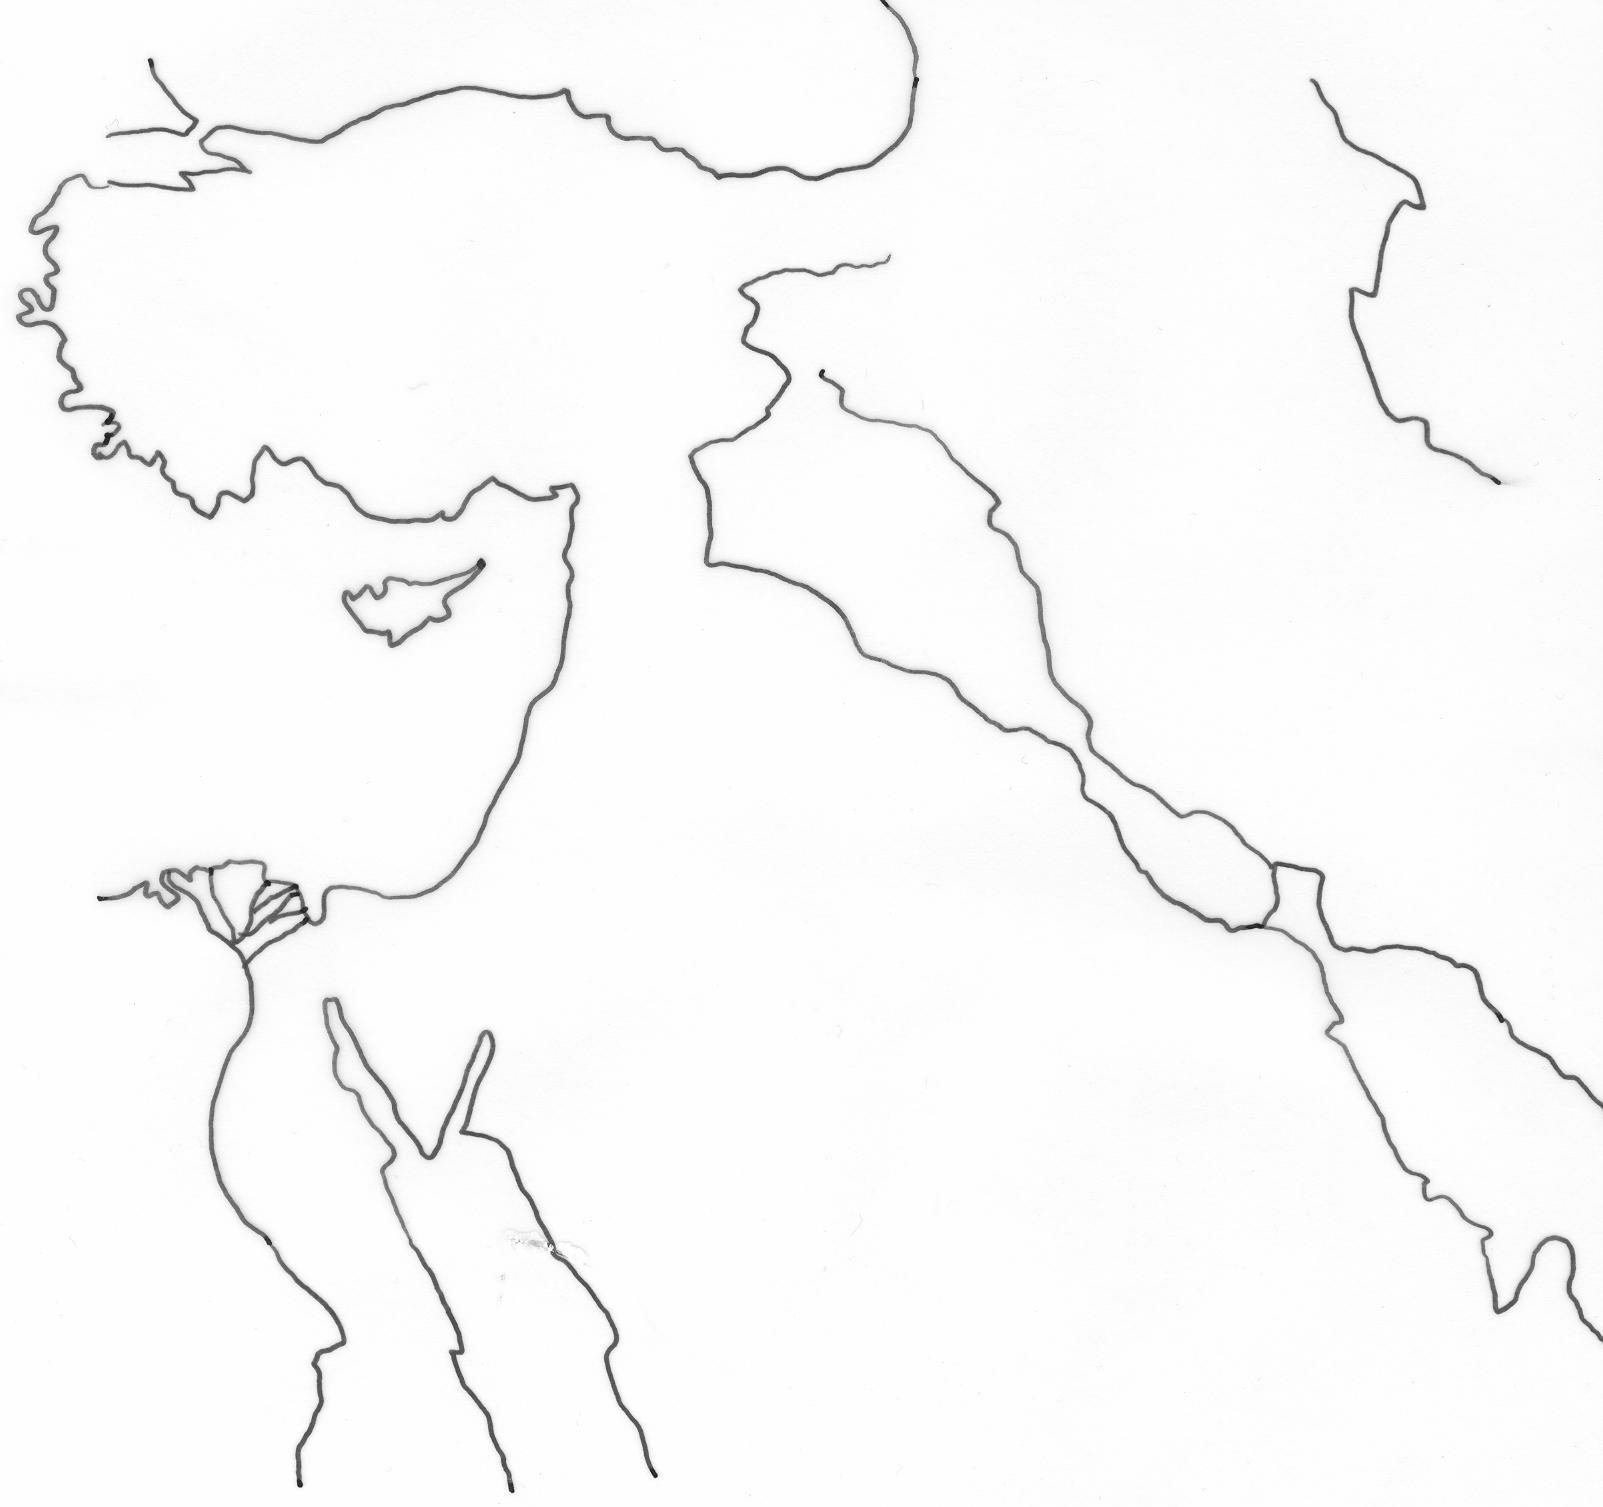 la carte politique france regions